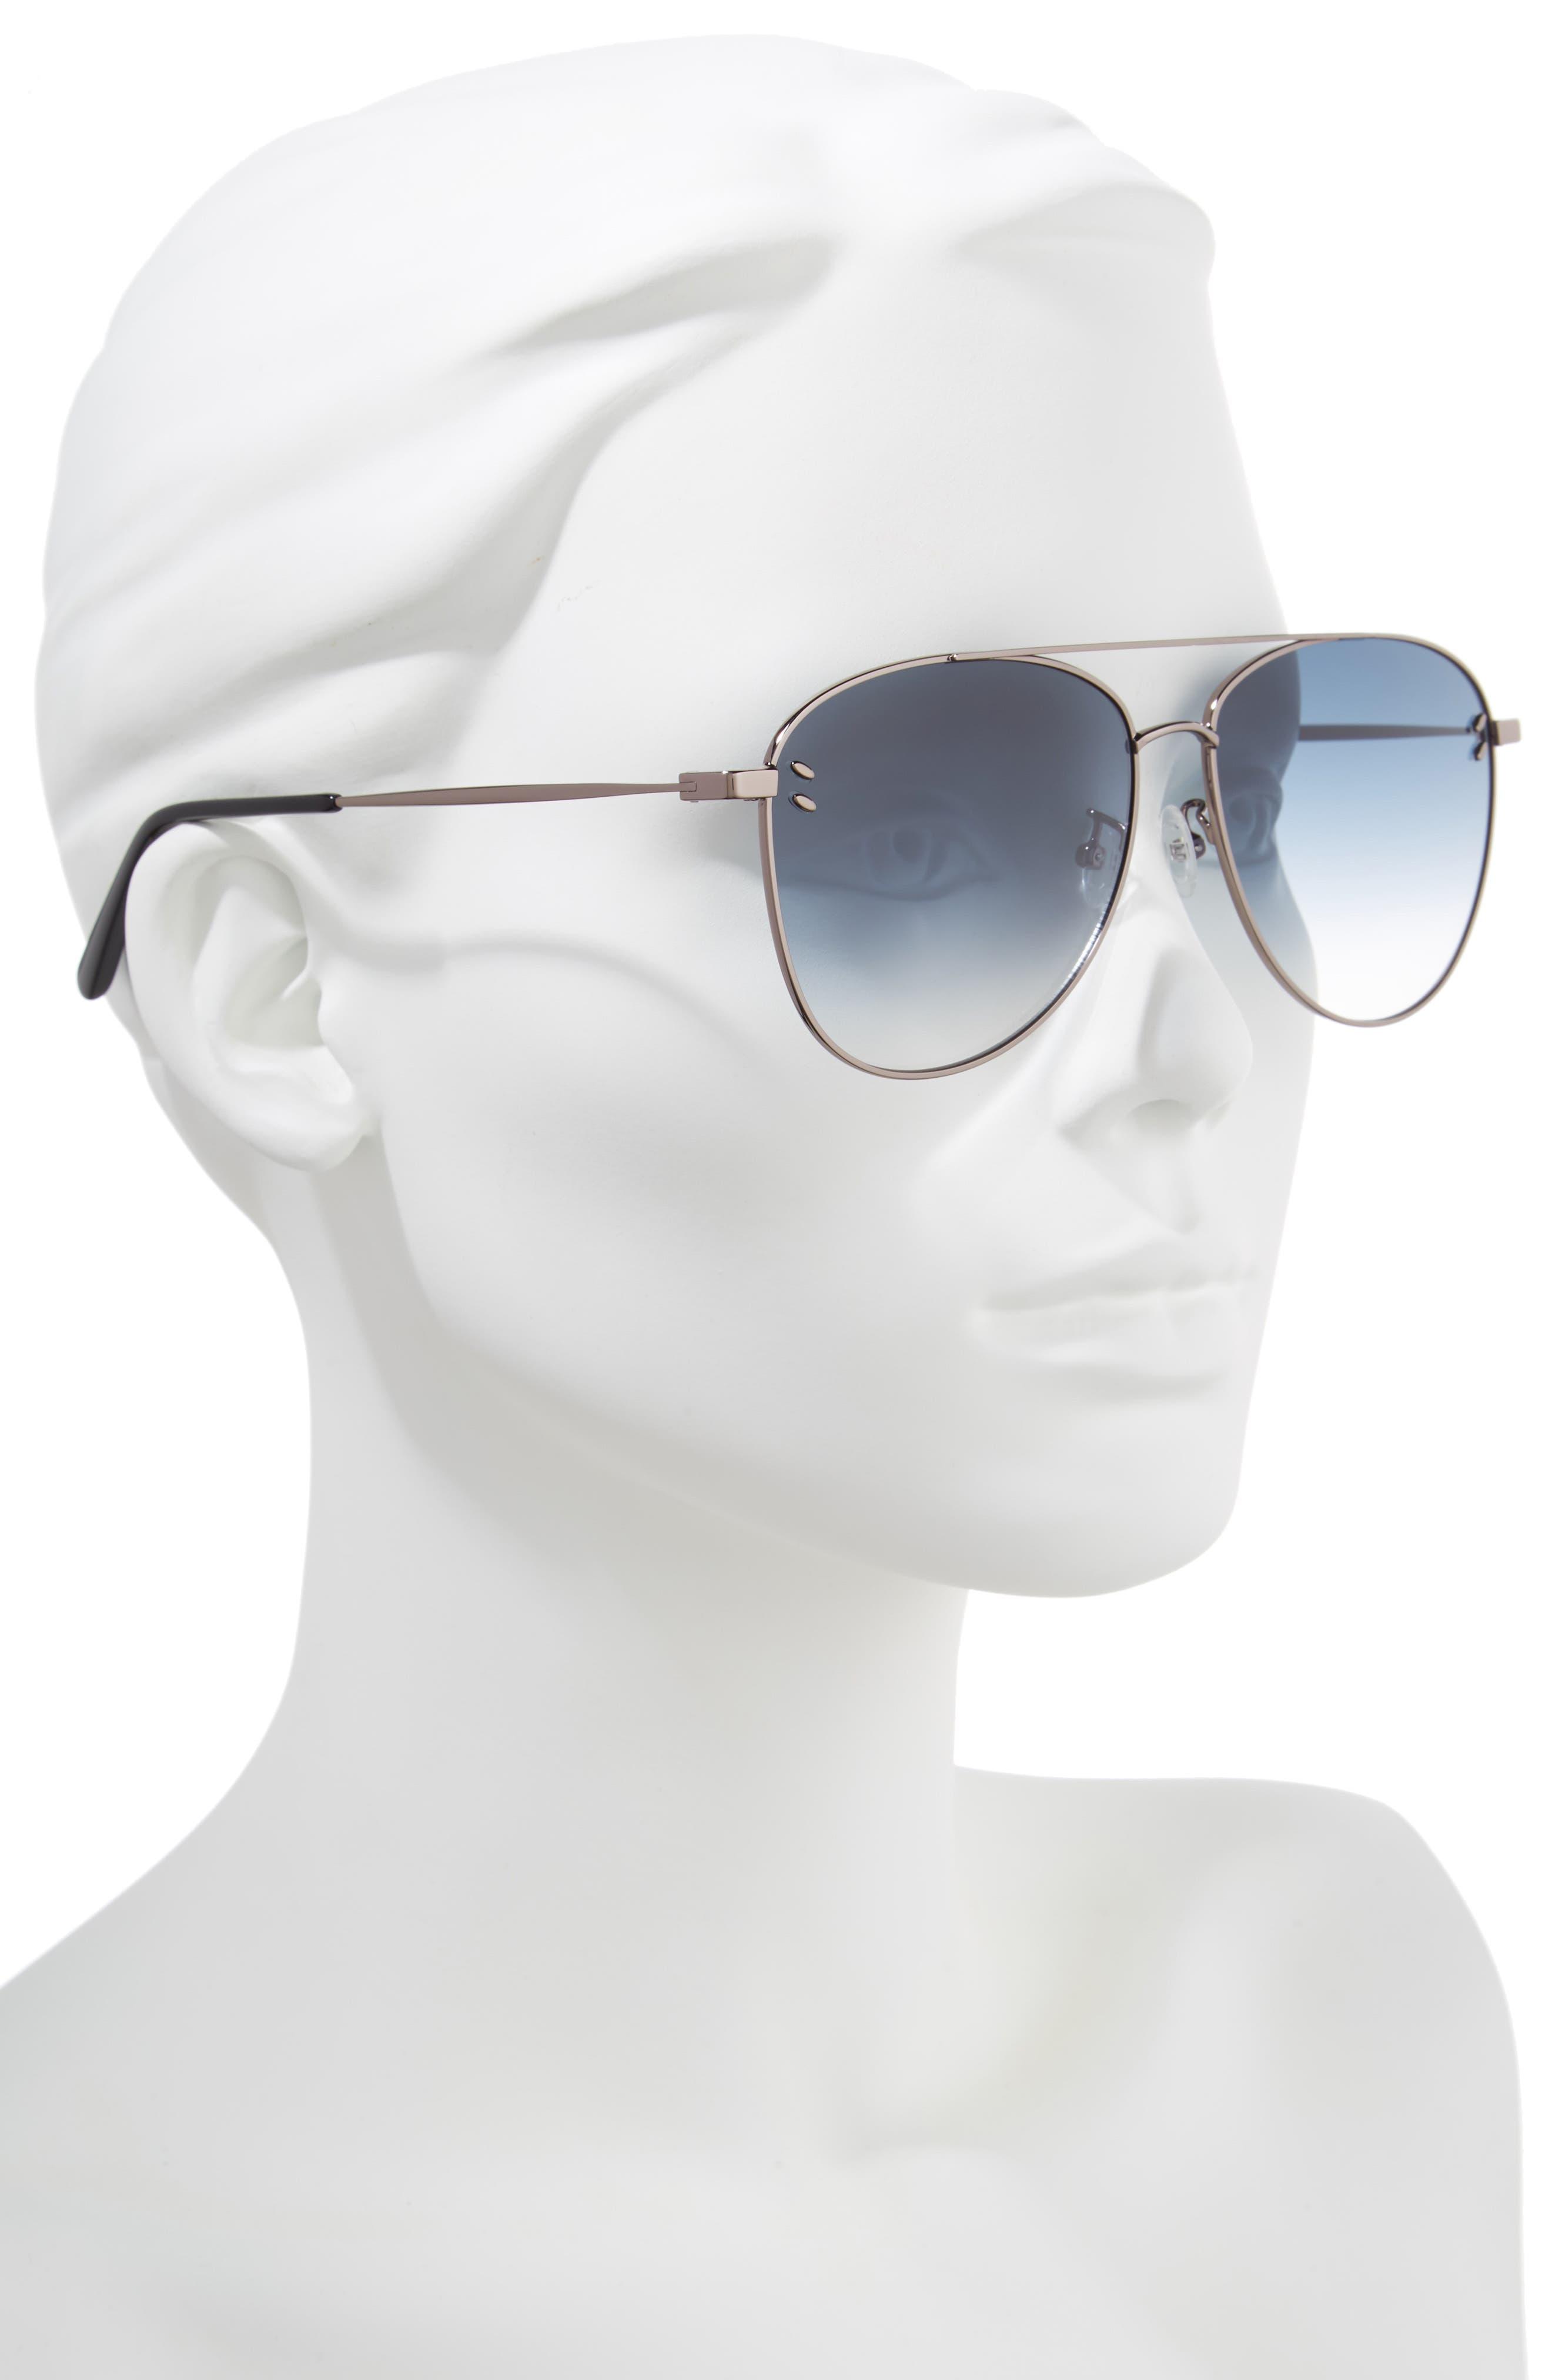 61mm Aviator Sunglasses,                             Alternate thumbnail 2, color,                             041